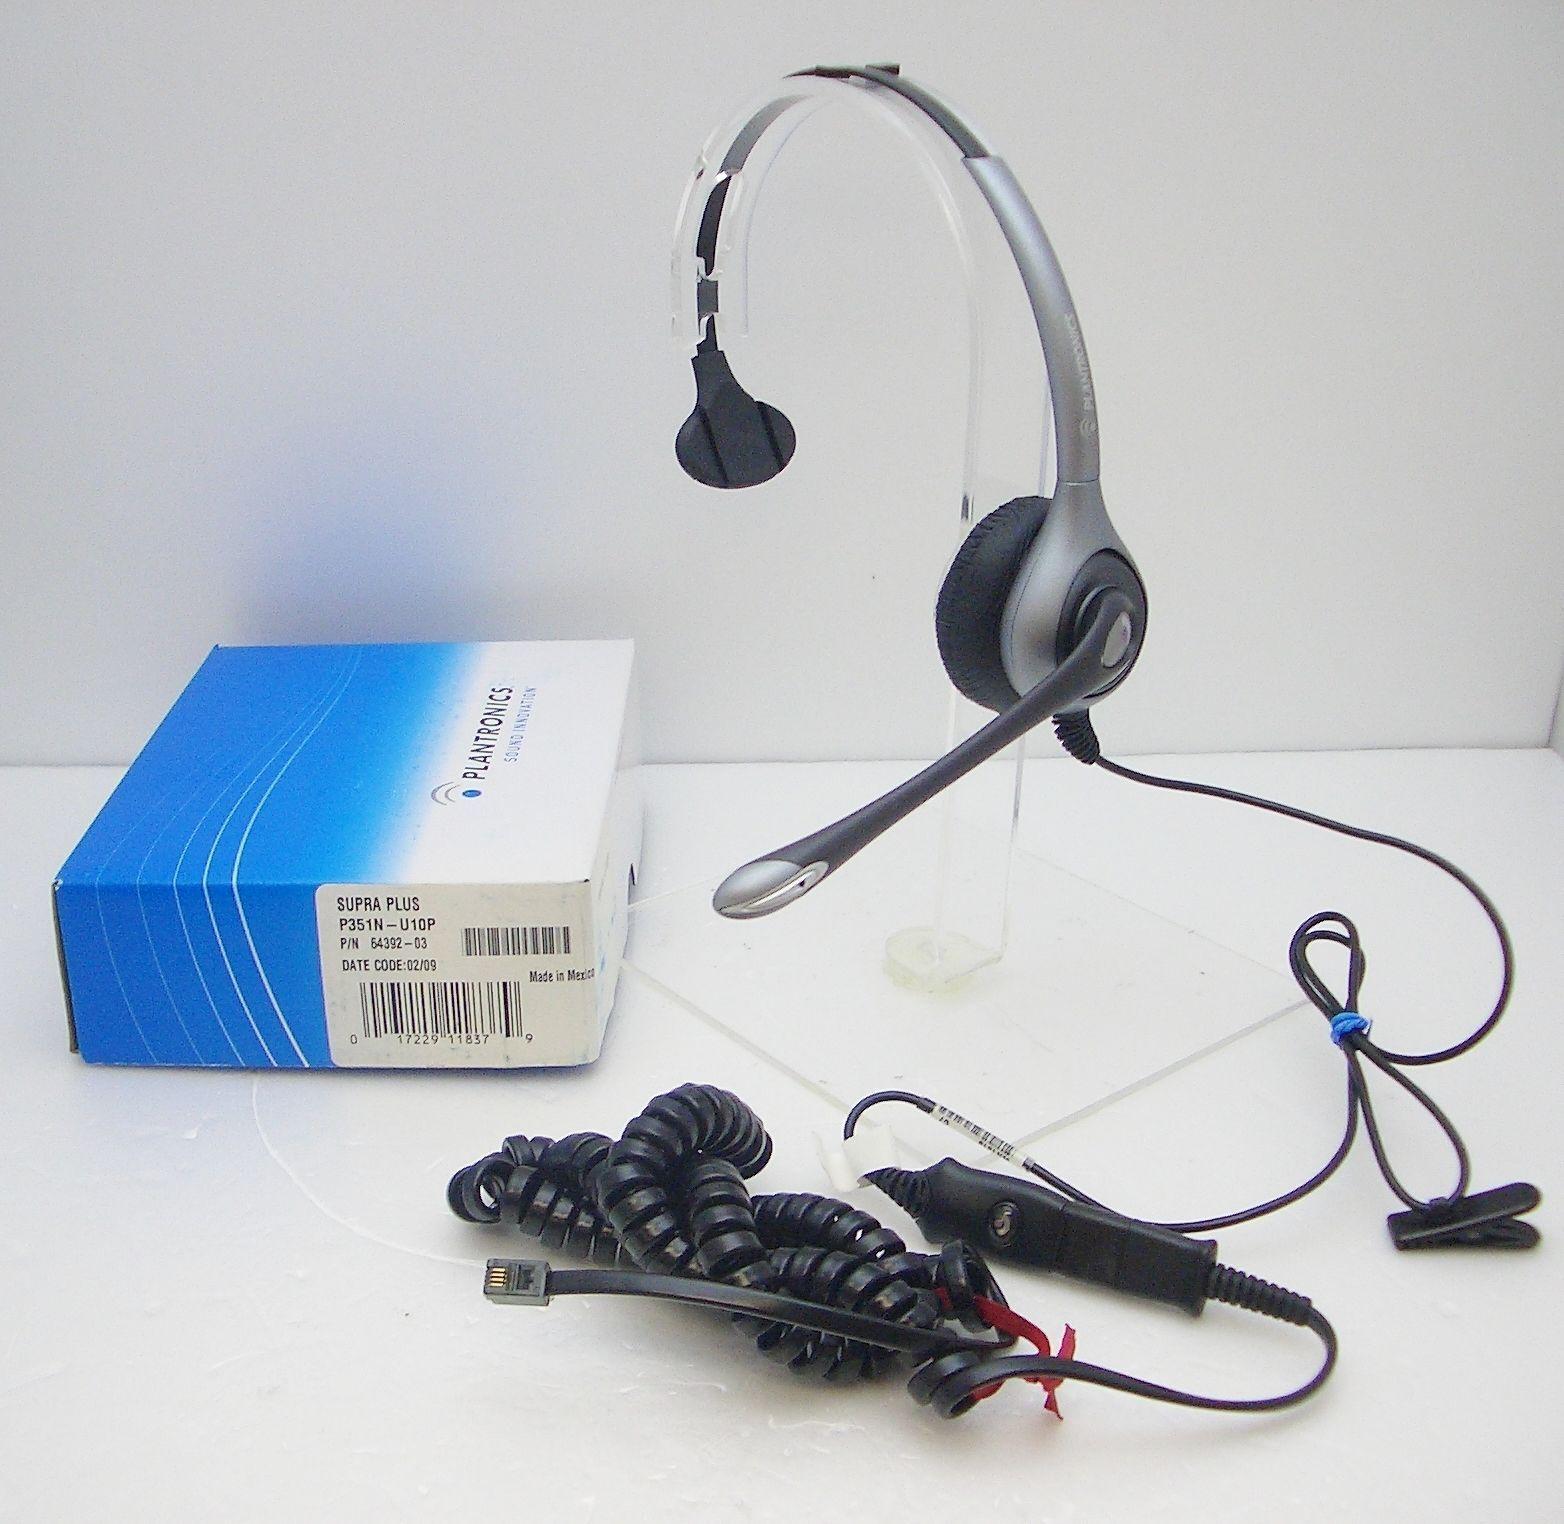 H251-U10P Monaural Headset for SNOM Toshiba Siemens Mitel Avaya Polycom 3Com NEC